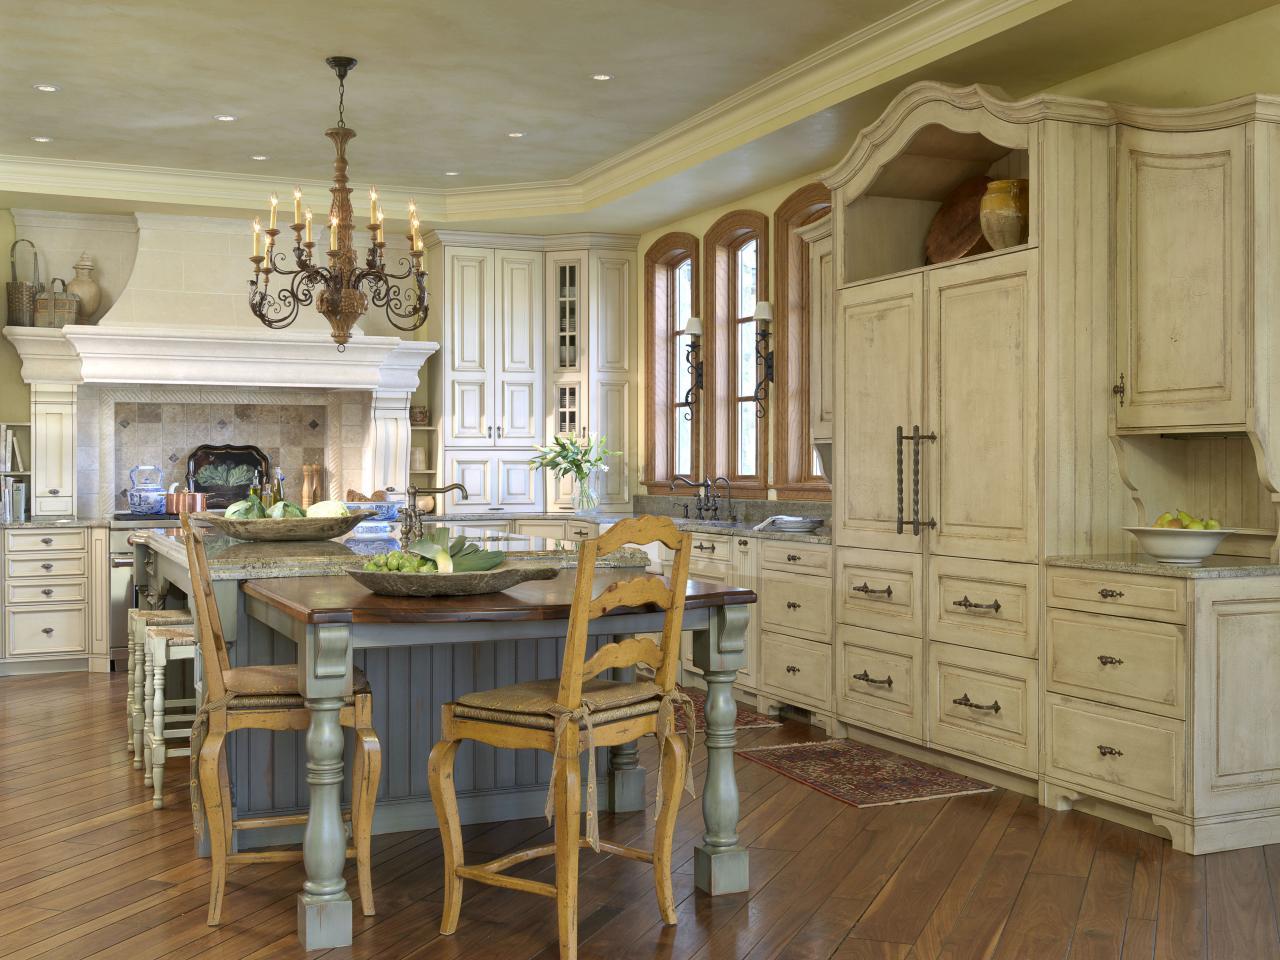 Кухня цвета ванили в стиле прованс